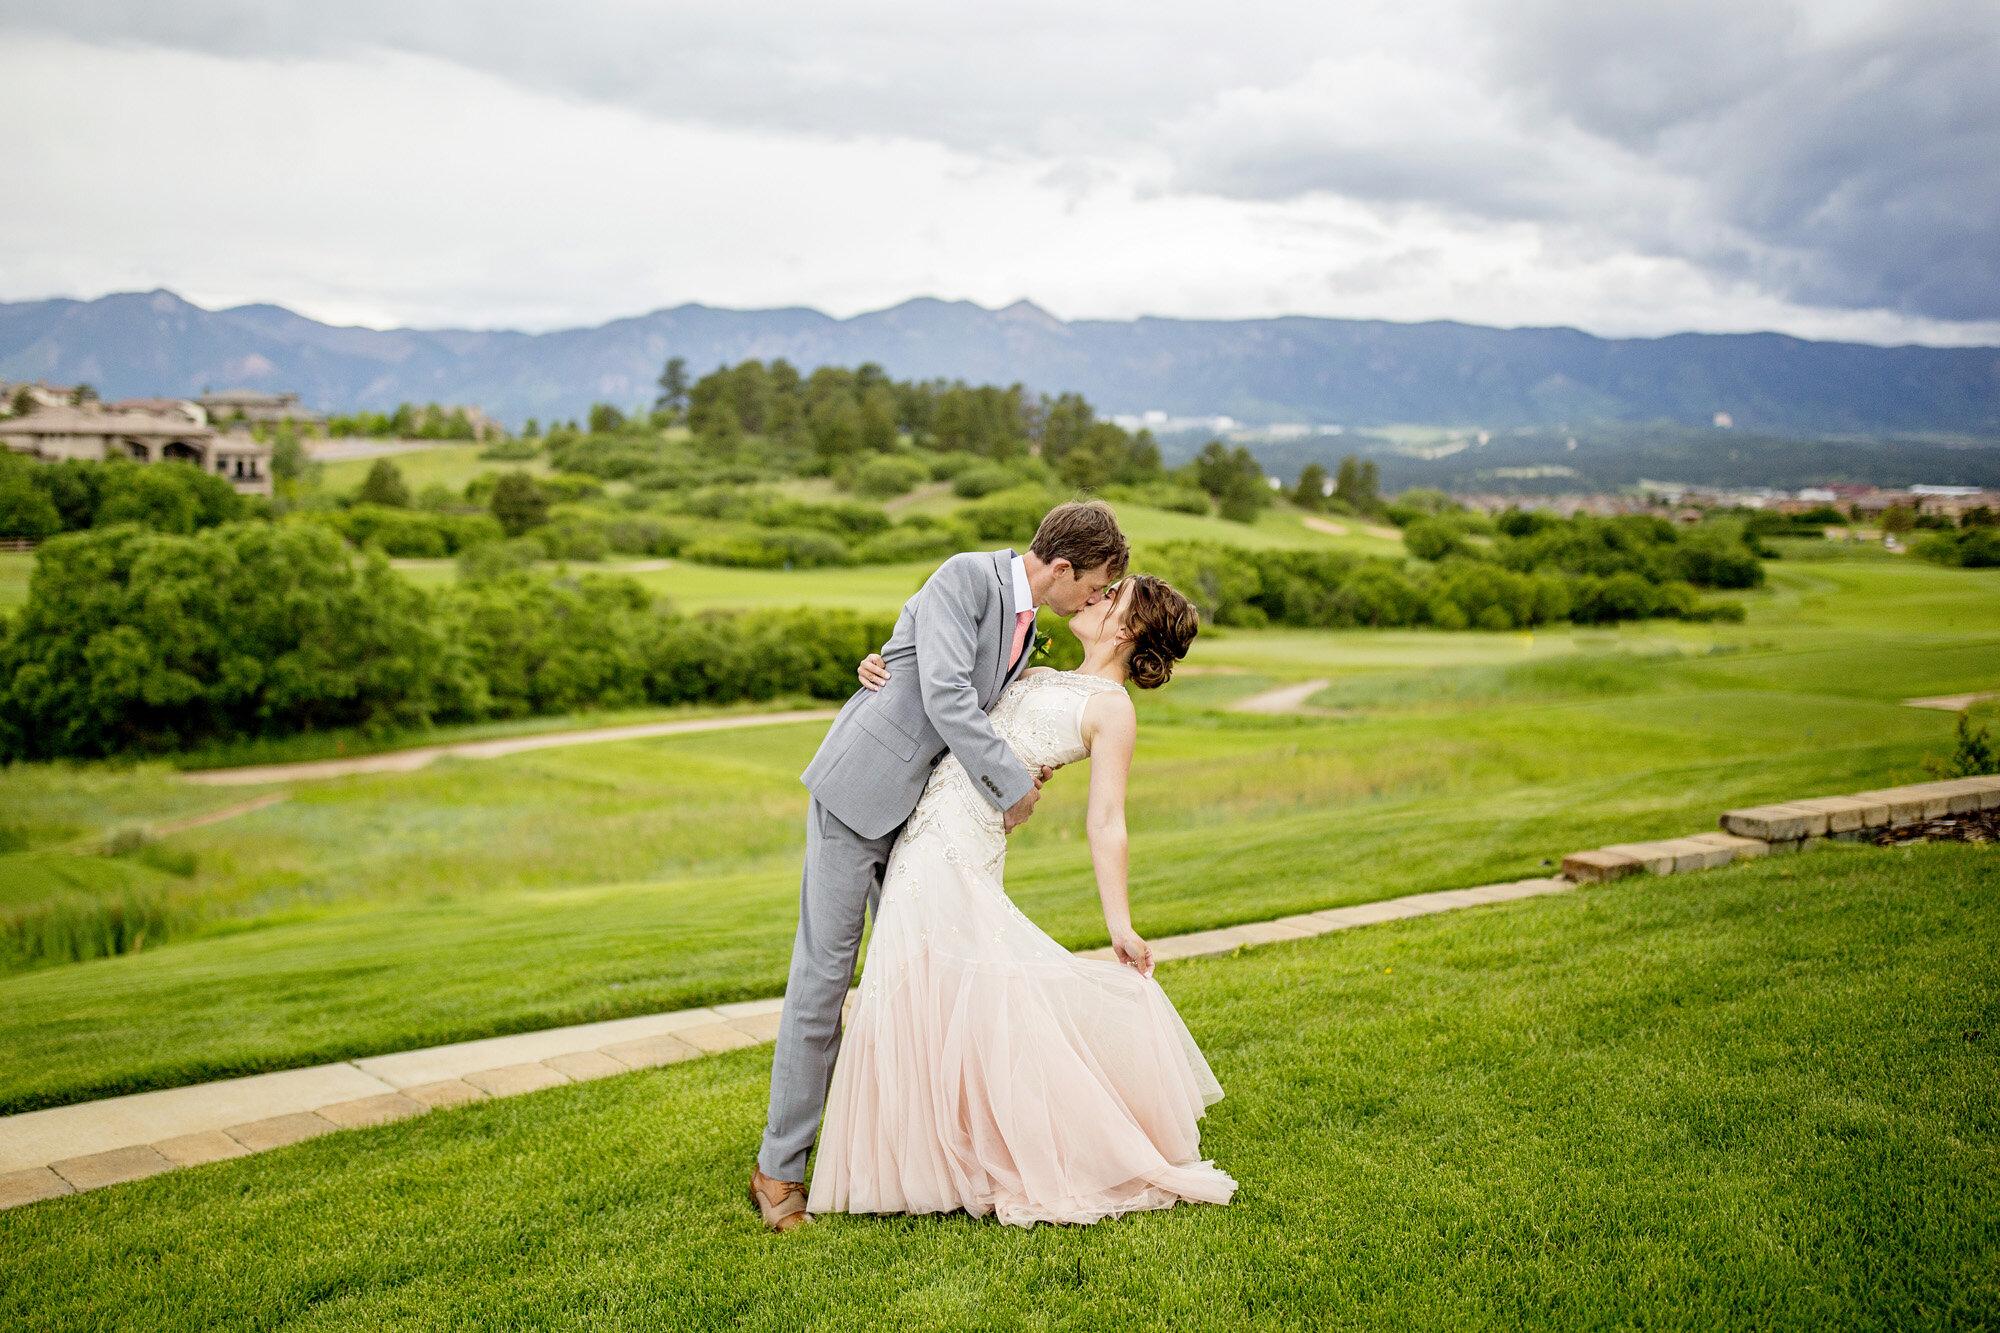 Seriously_Sabrina_Photography_Colorado_Springs_Club_at_Flying_Horse_Destination_Wedding_ODwyer82.jpg